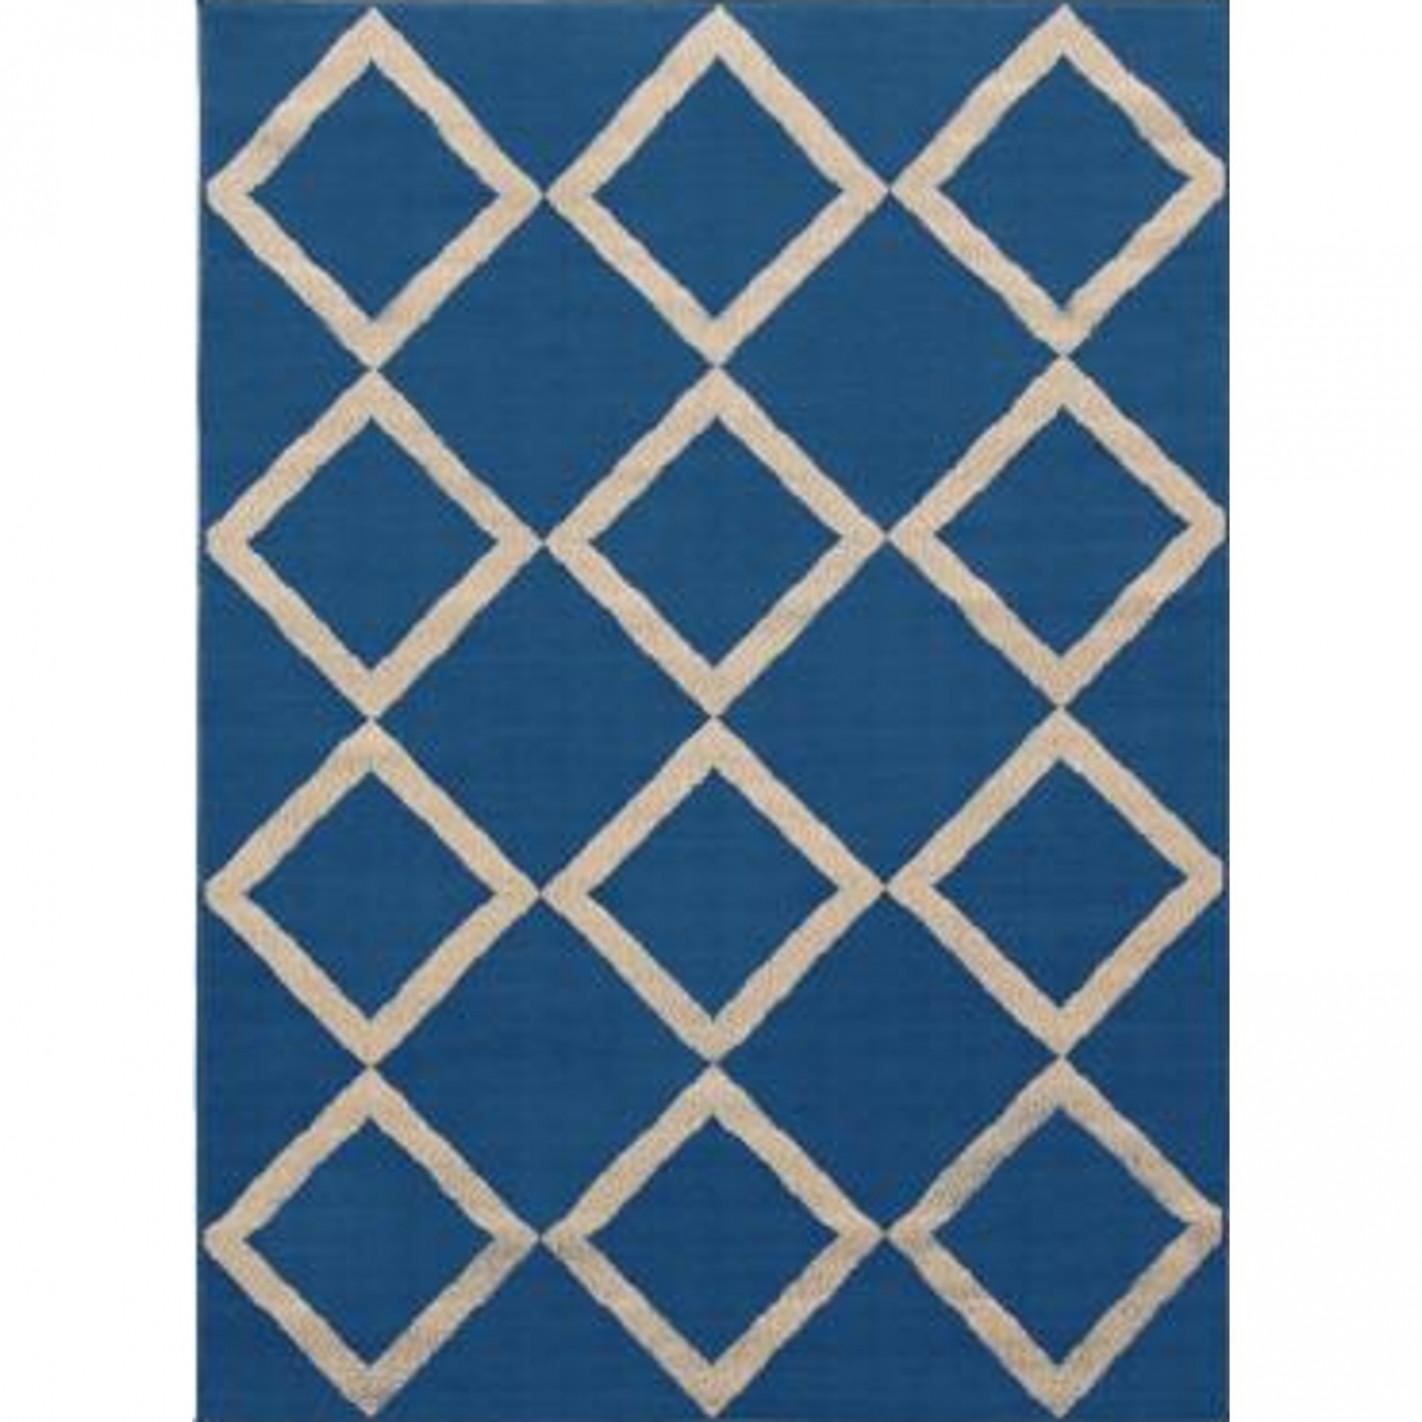 tapis bleu scandinave avec losange blanc 100 artisanal. Black Bedroom Furniture Sets. Home Design Ideas